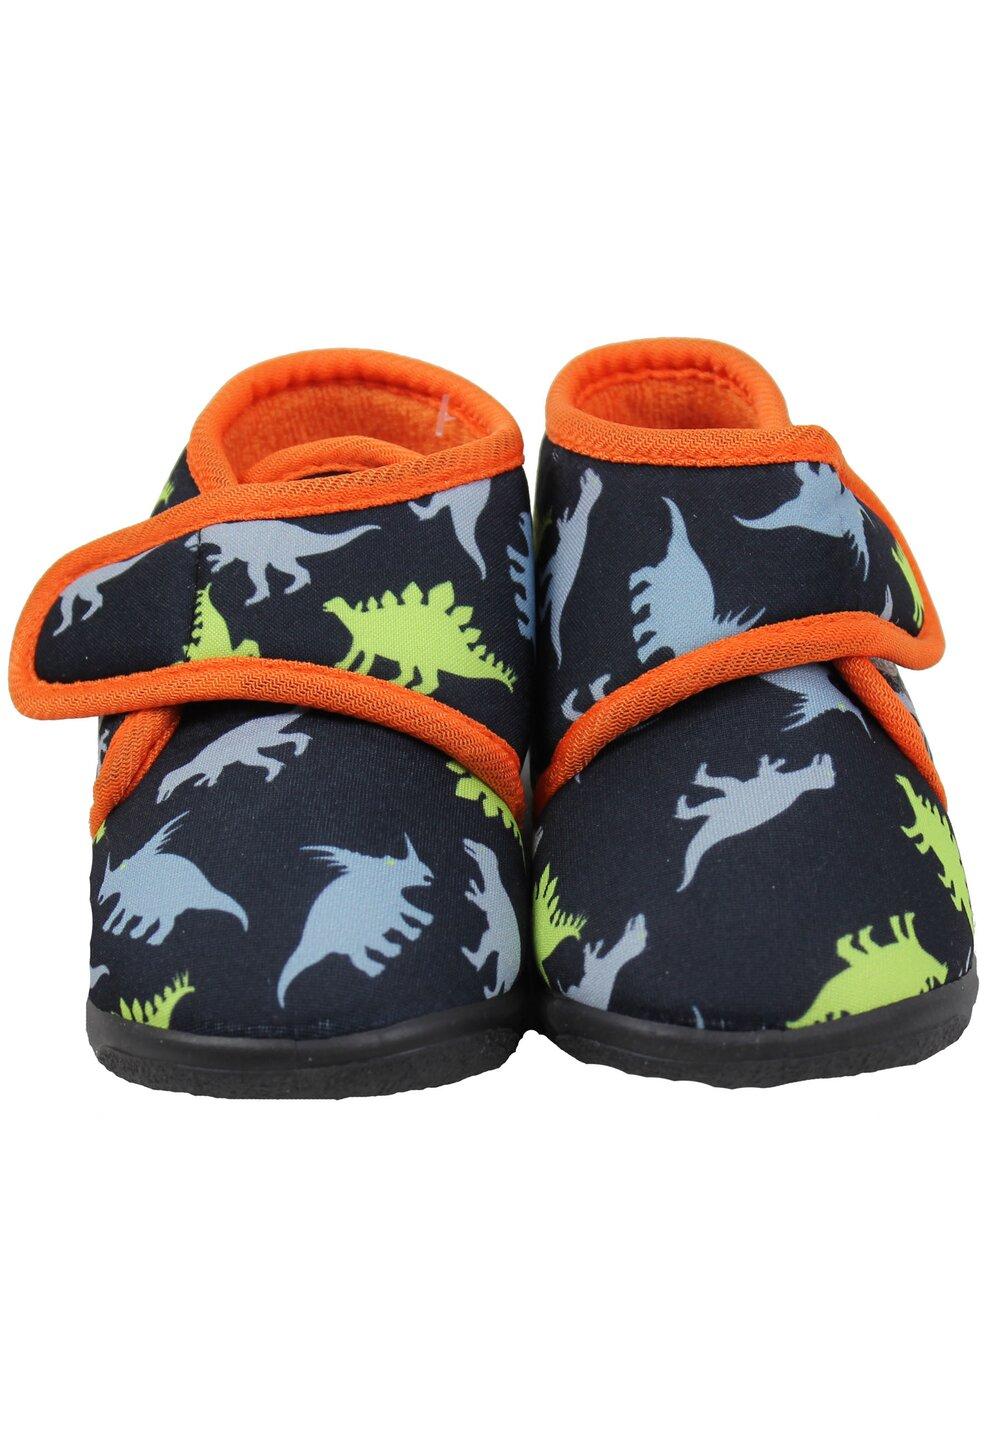 Incaltaminte interior, dinozauri, negru cu portocaliu imagine